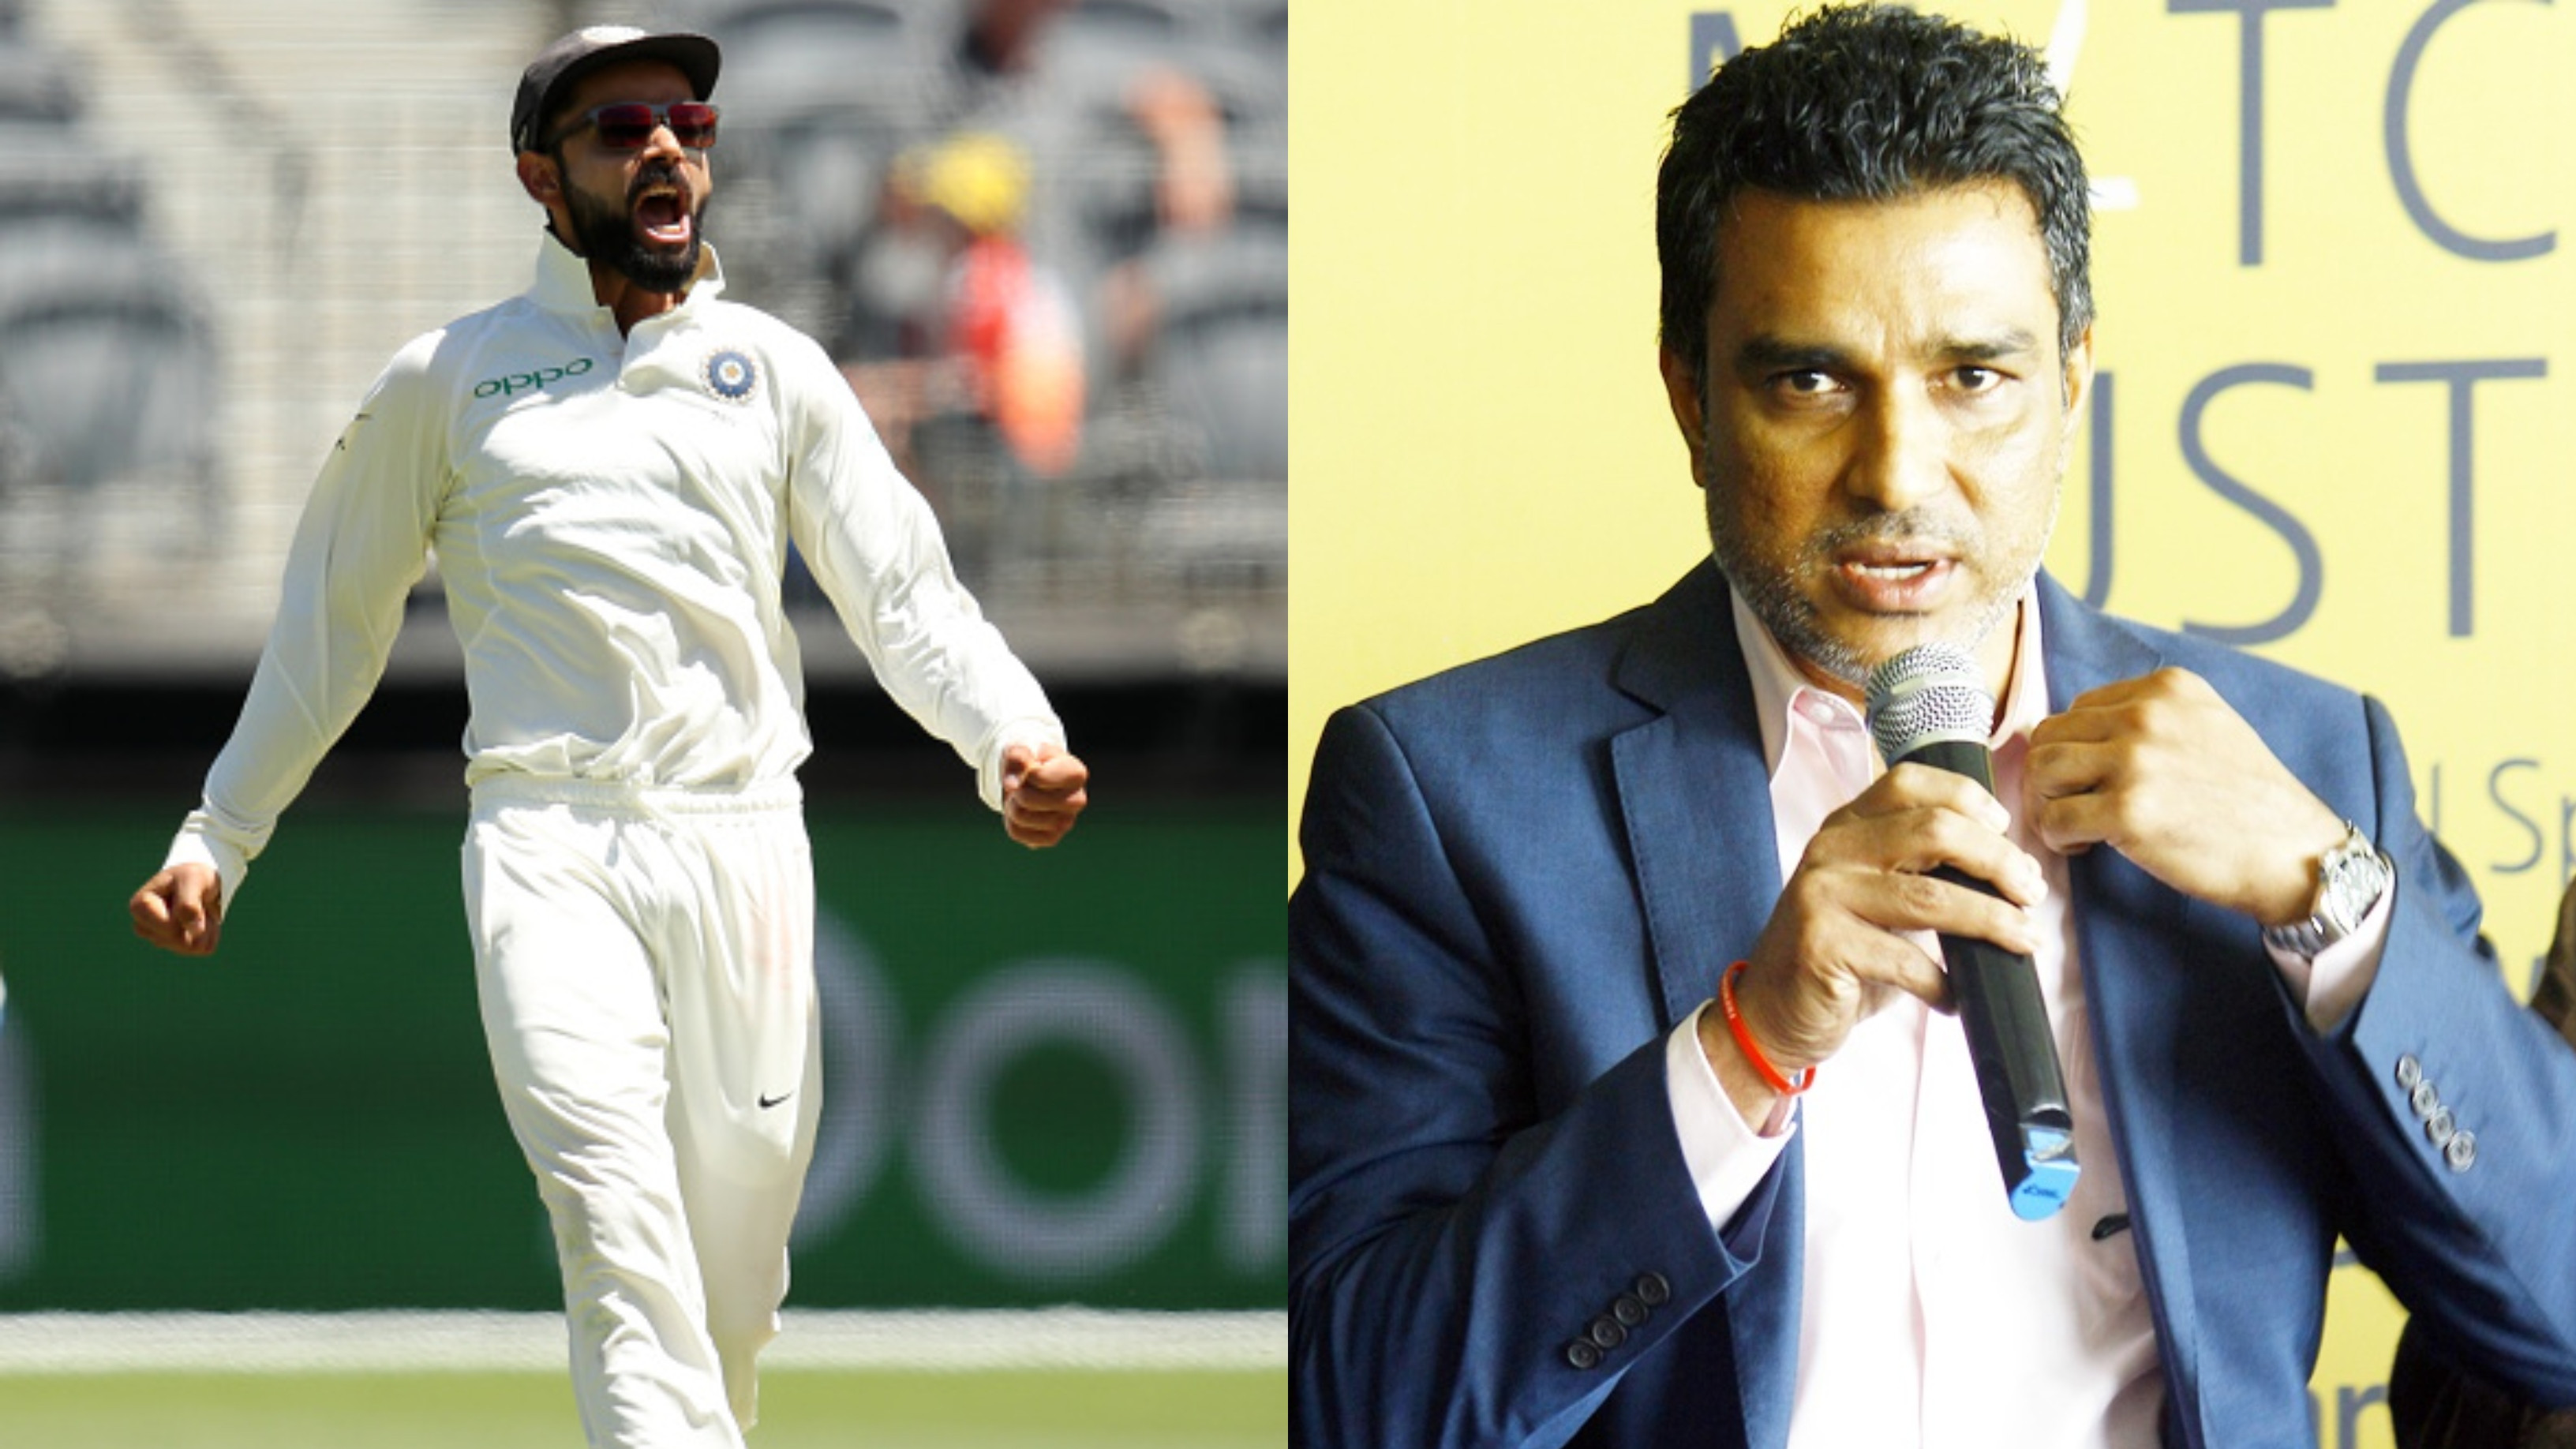 AUS v IND 2018-19: Sanjay Manjrekar criticizes Virat Kohli's on-field attitude and antics